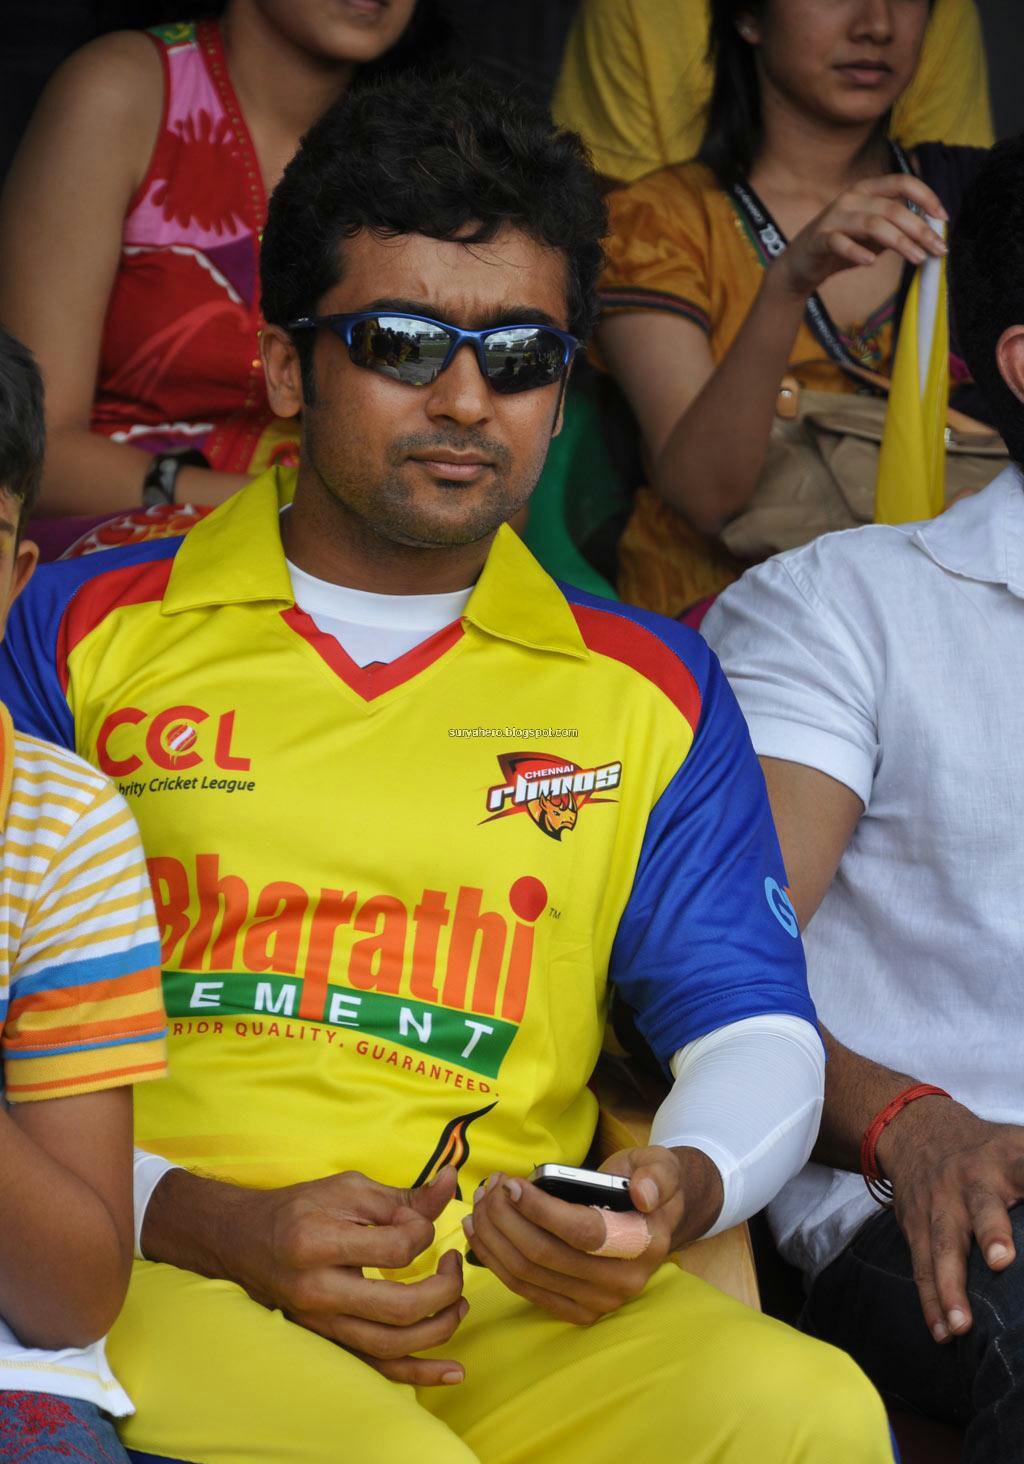 Surya at celebrity cricket league stills actor surya surya at celebrity cricket league stills thecheapjerseys Gallery